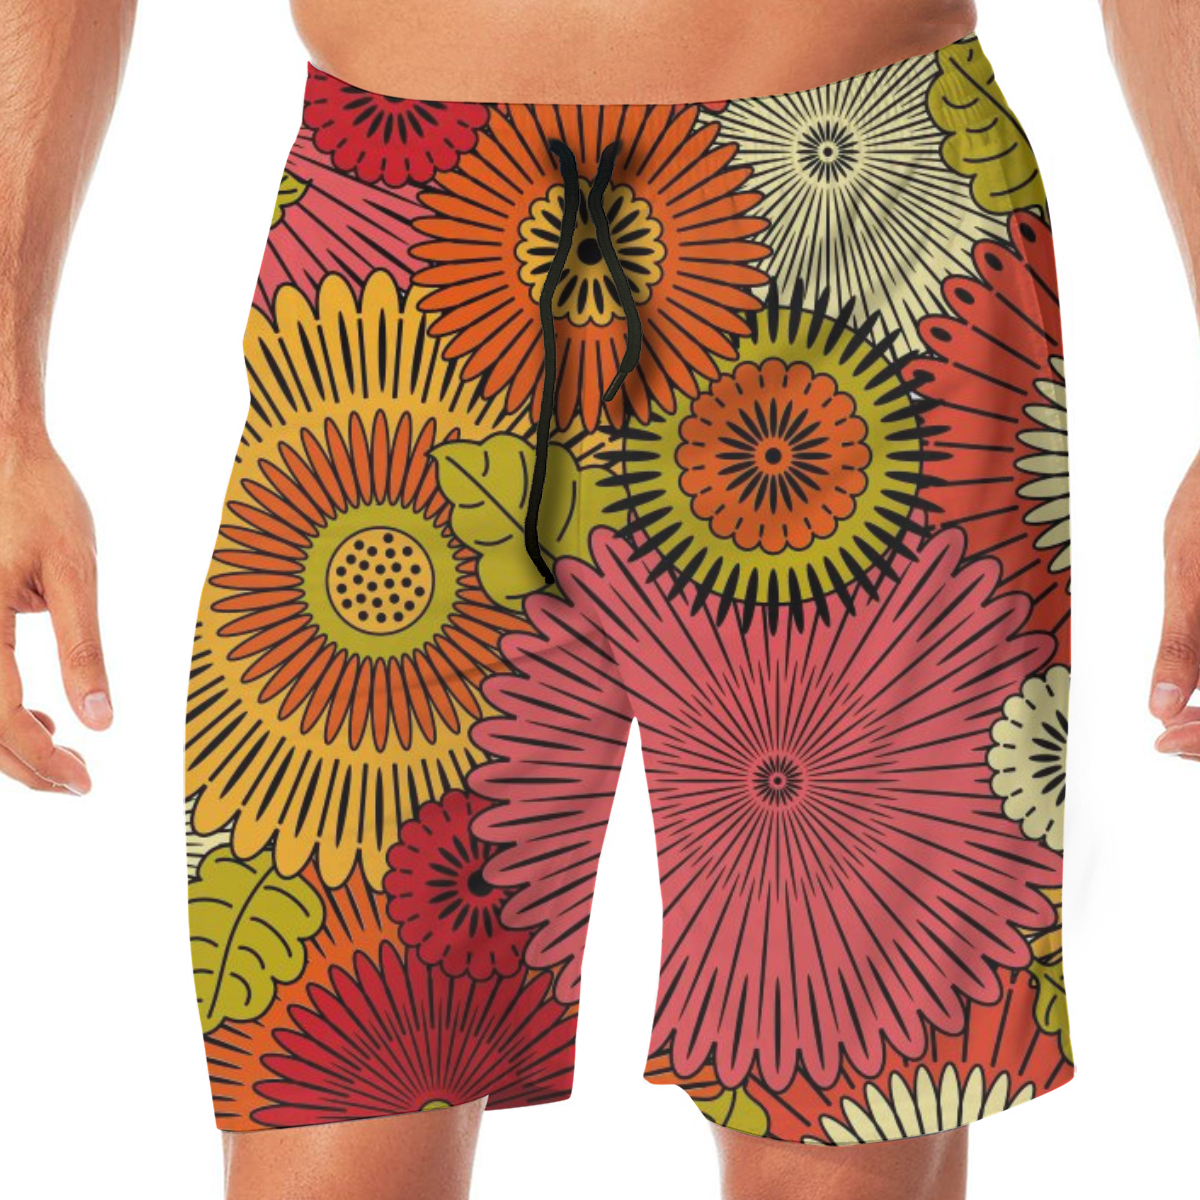 Ethnic Japanese Typical Pattern Swimming Shorts For Men Swimwear Man Swimsuit Swim Trunks Summer Bathing Beach Wear